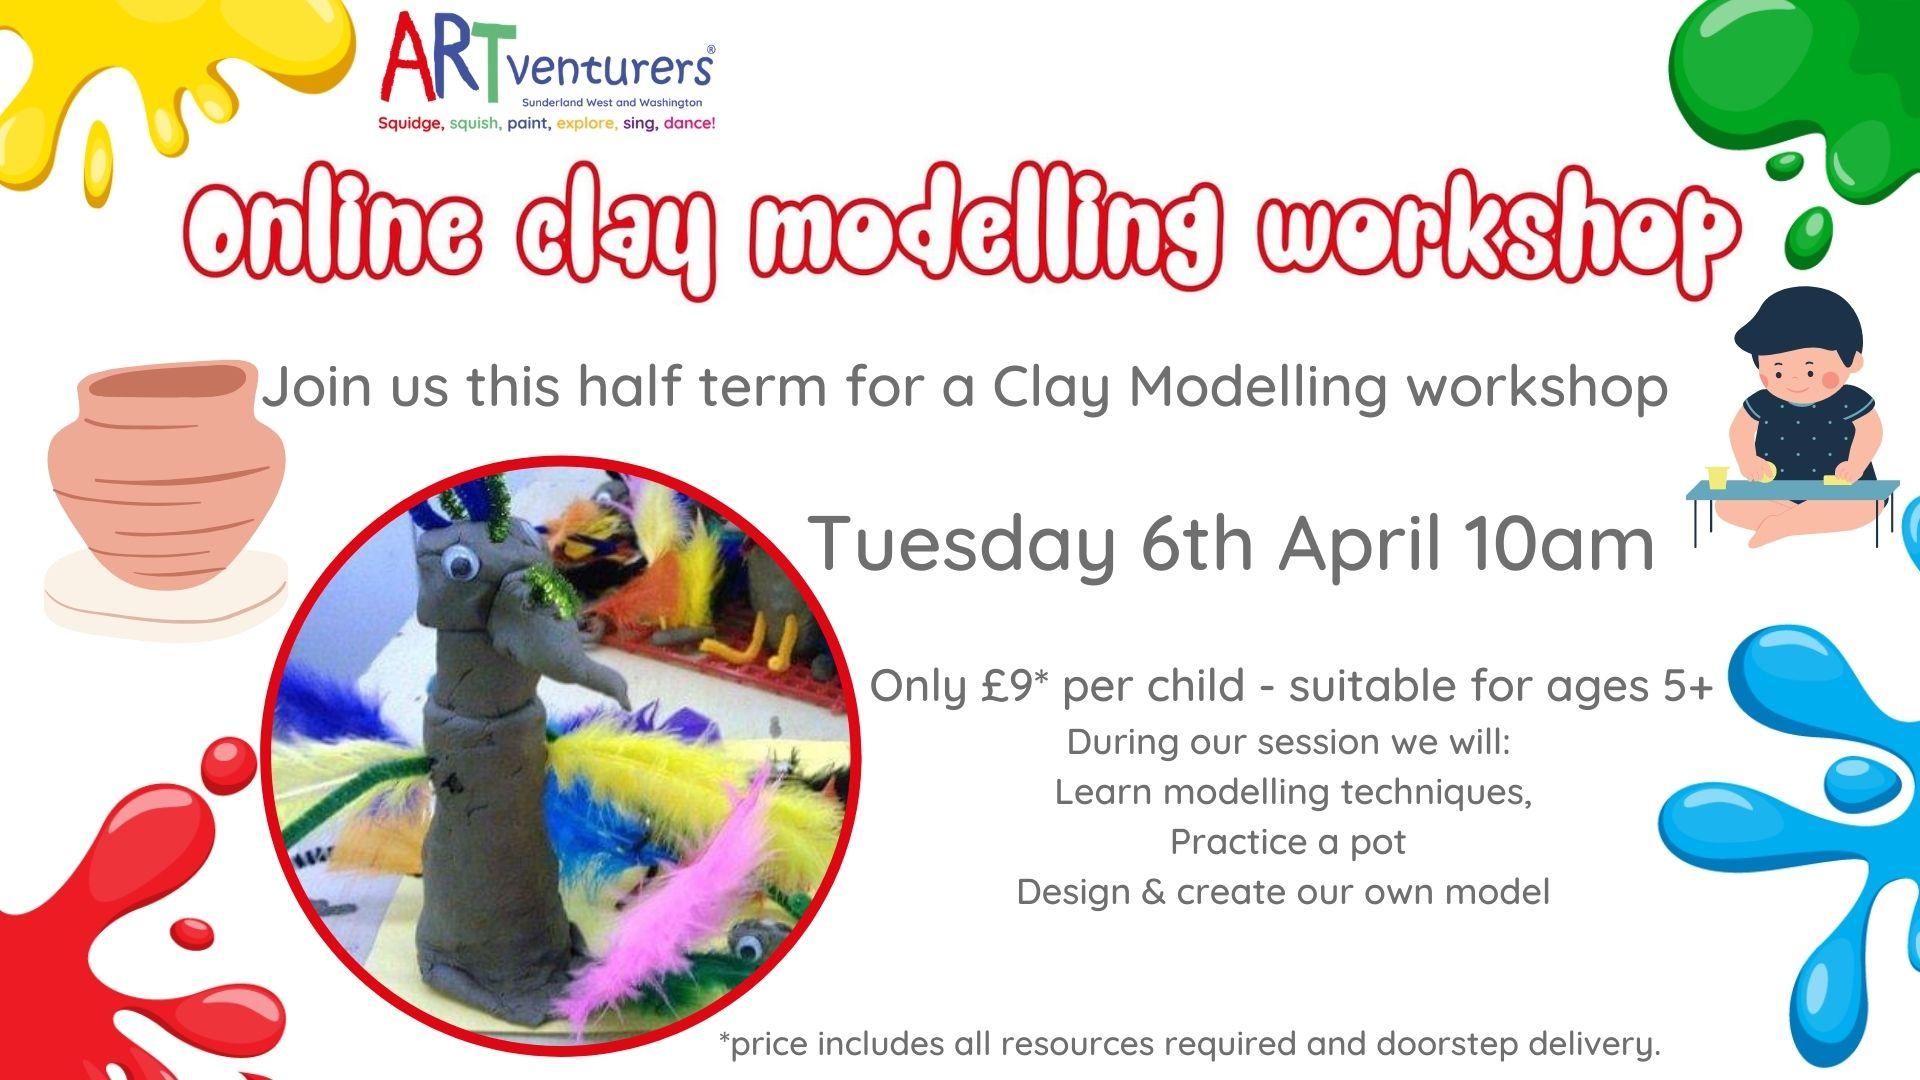 Online Clay Modelling Workshop Washington